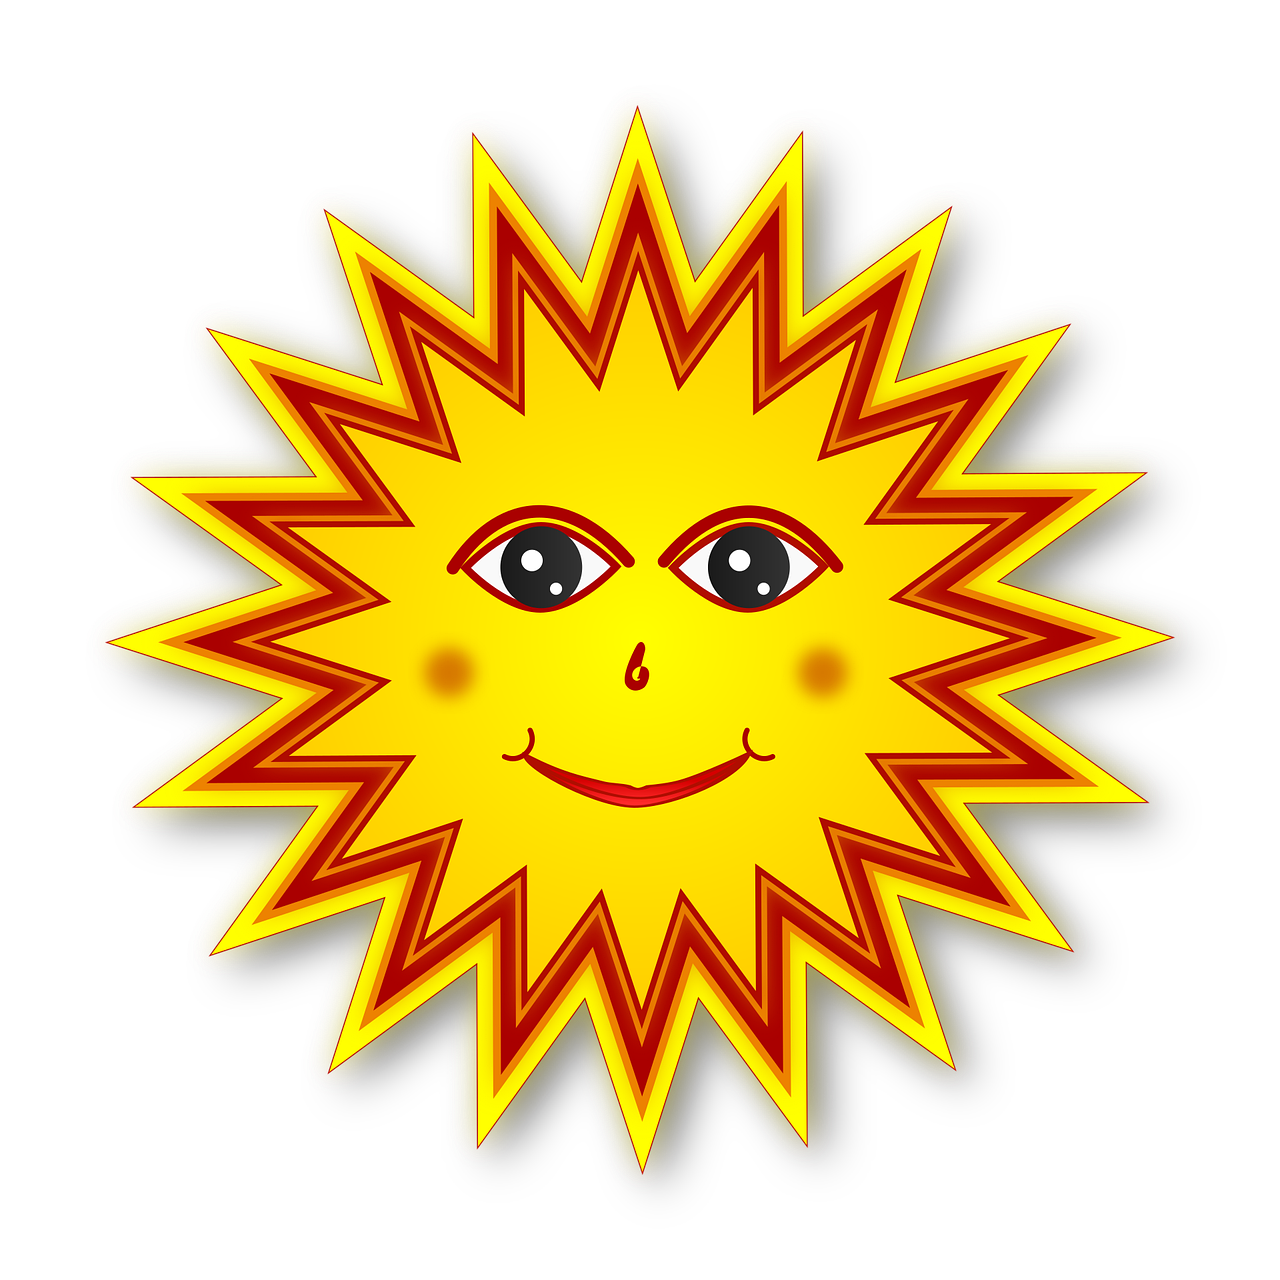 Sun Sunny Sunshine - Free vector graphic on Pixabay